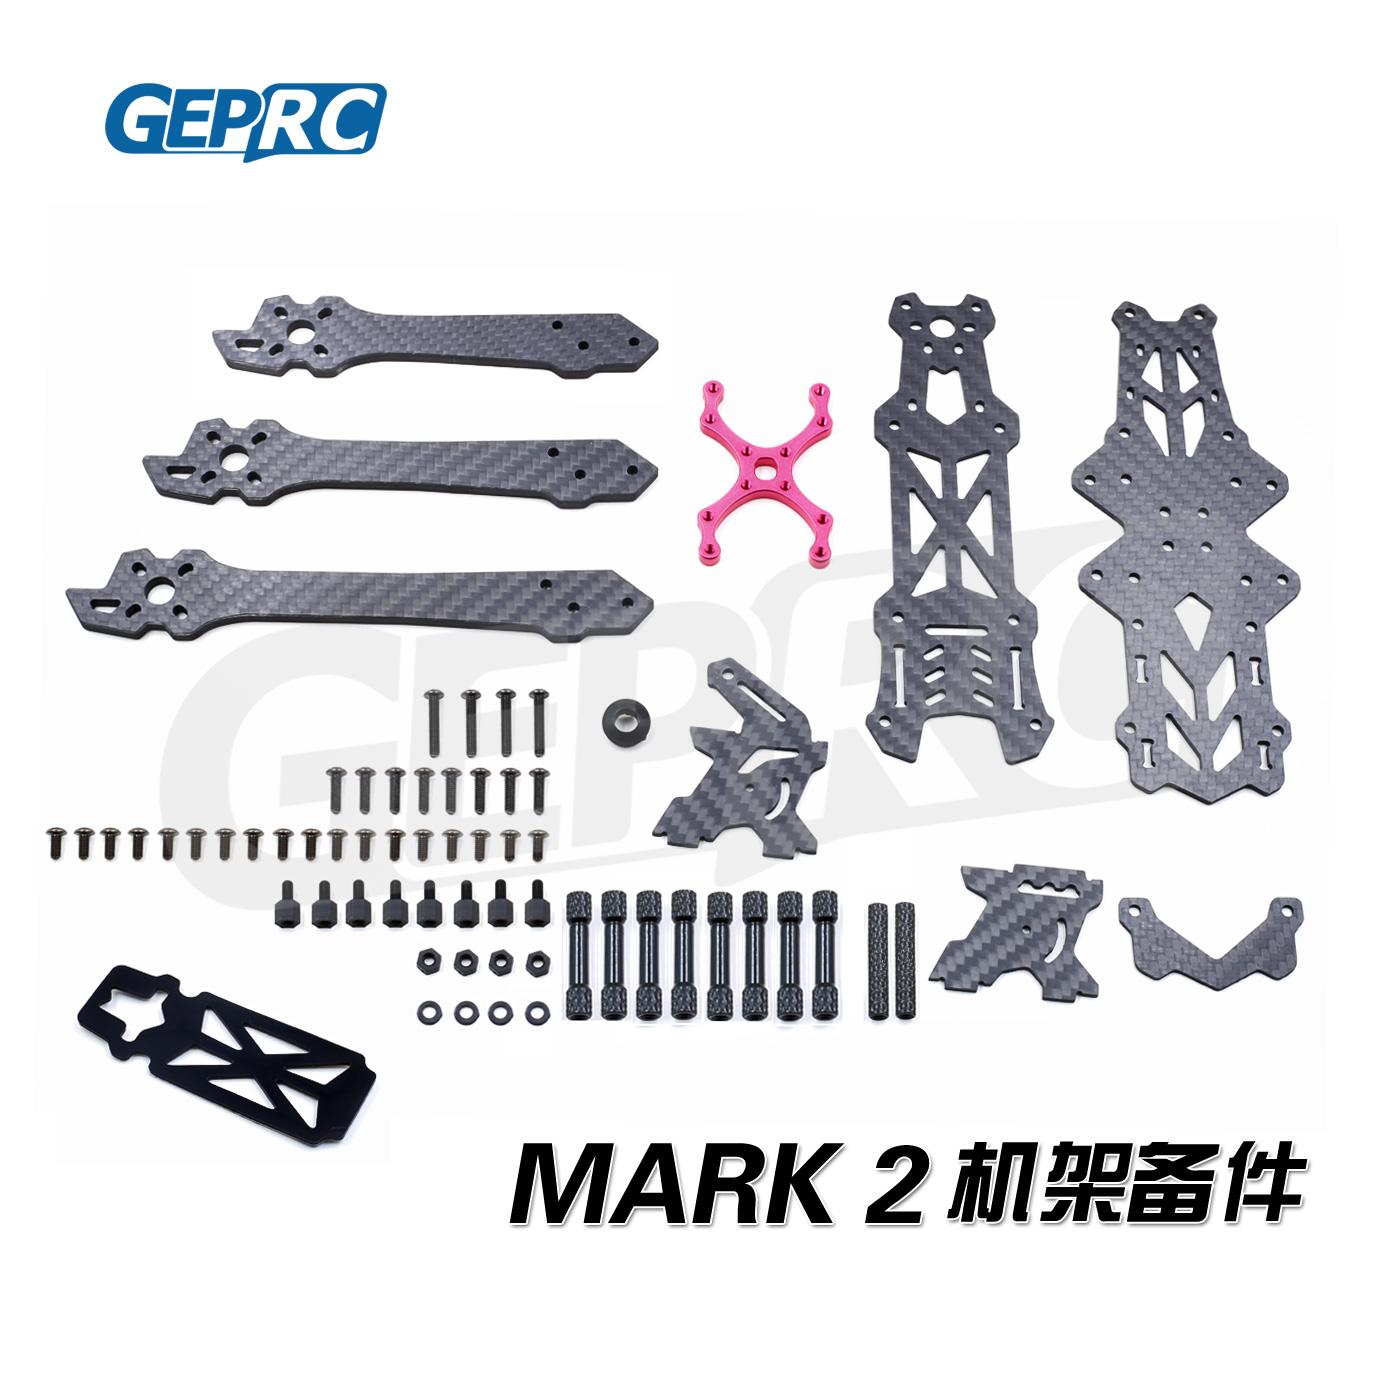 geprc/格普mark2维修机机架备件